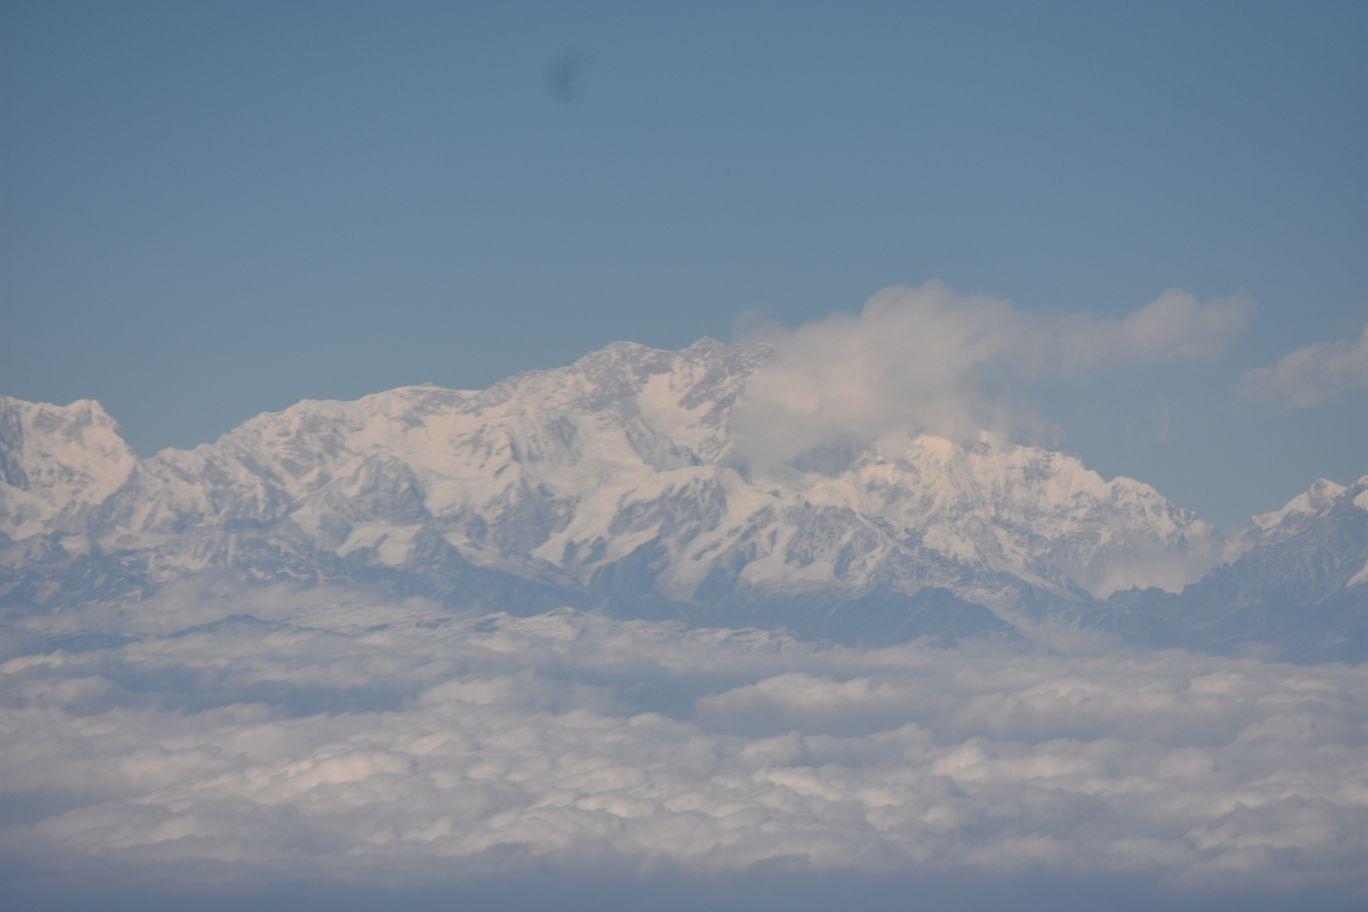 Photo of Darjeeling By Surendra Mohite